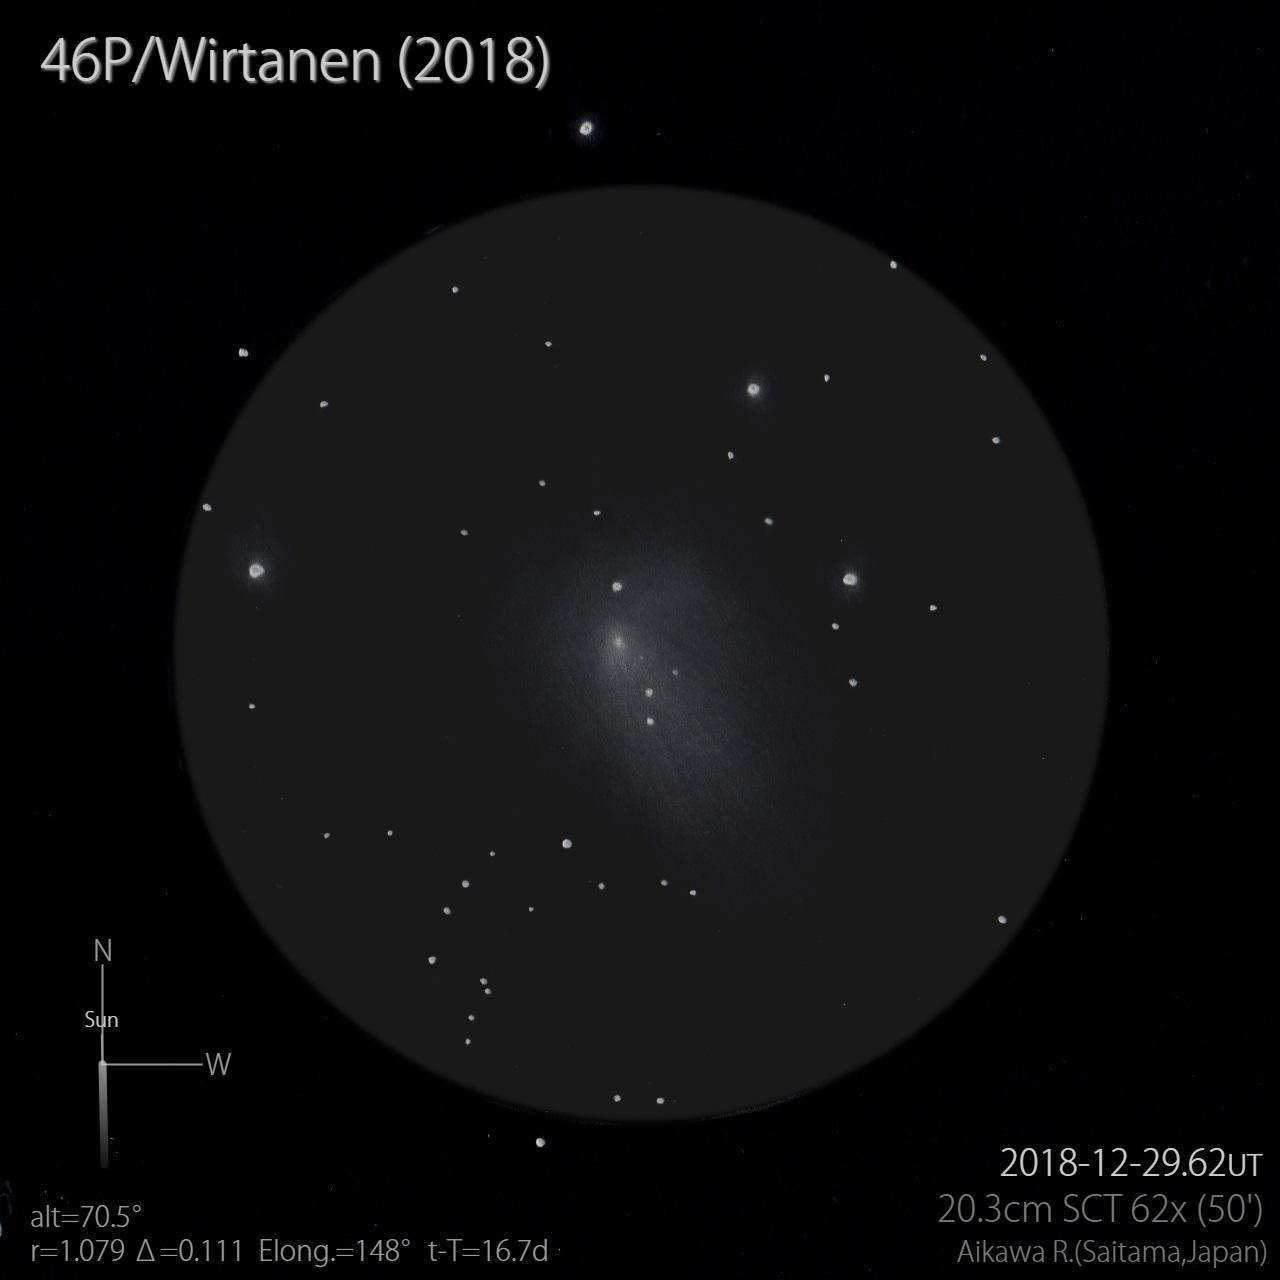 0046P-2018_011-editPosi-25-0.8.jpg